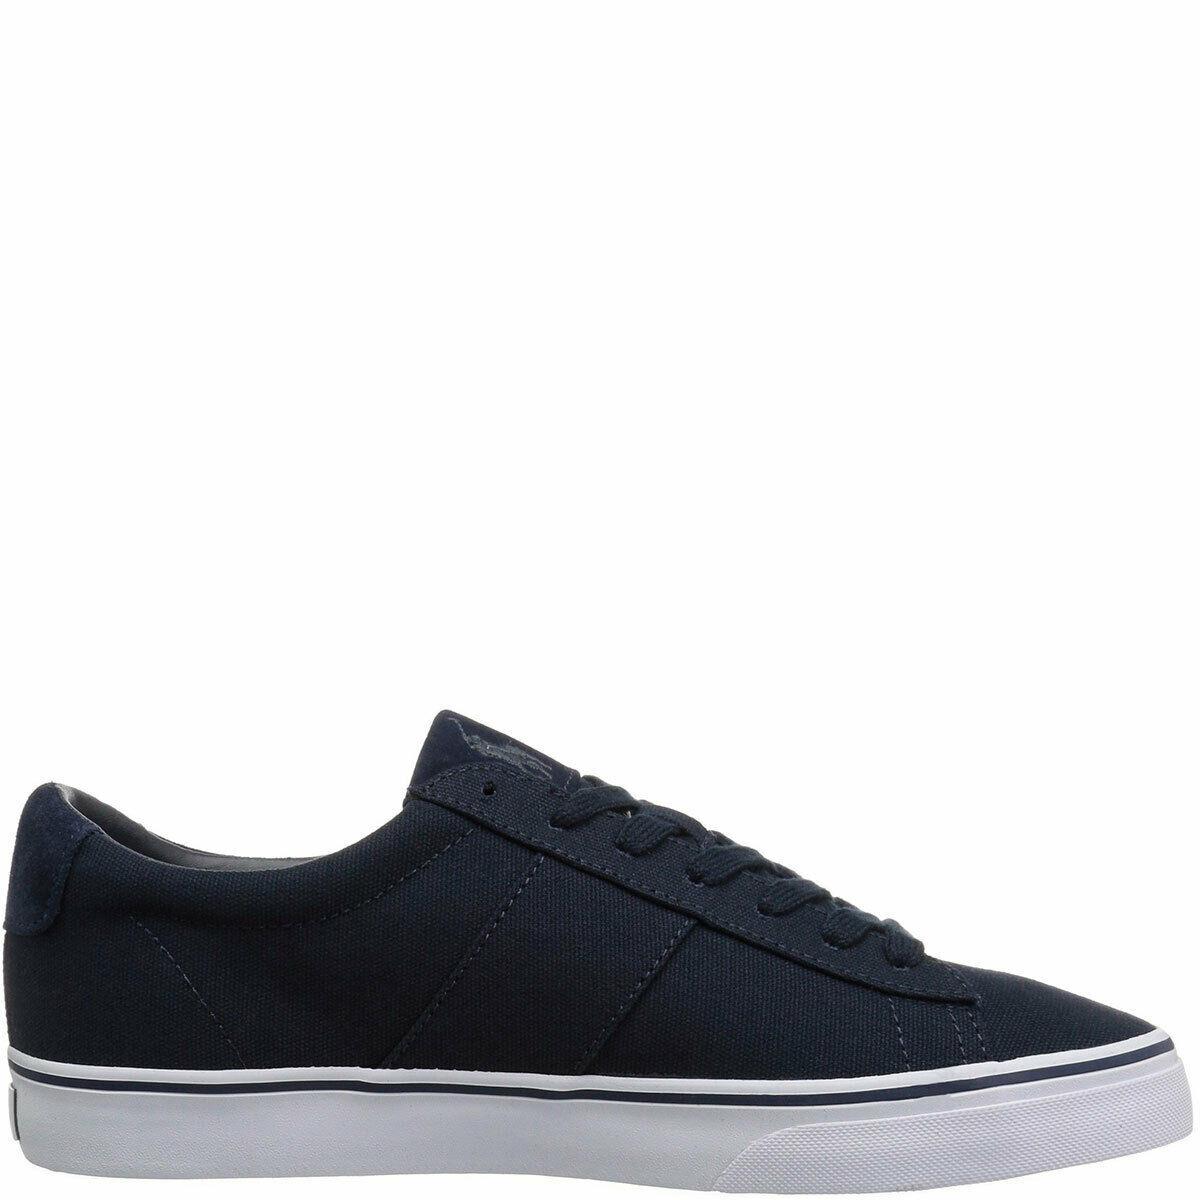 Polo Ralph Lauren Mens Sayer Low-Top Sneakers Black 9.5 D MSRP 50 New